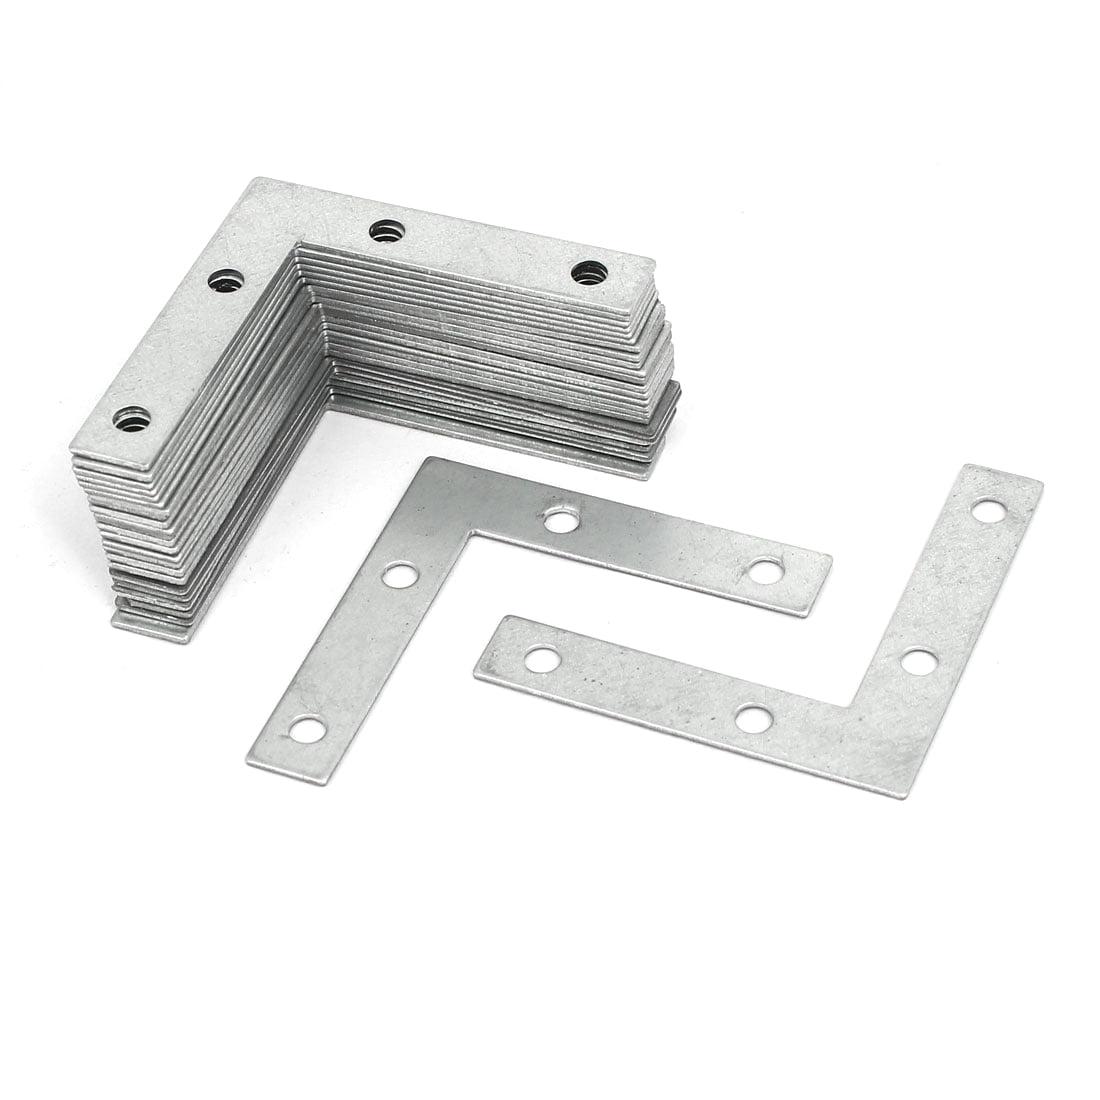 uxcell 24mmx9mmx0.5mm Metal Rectangle Flat Repair Fixing Plate Angle Bracket 100pcs